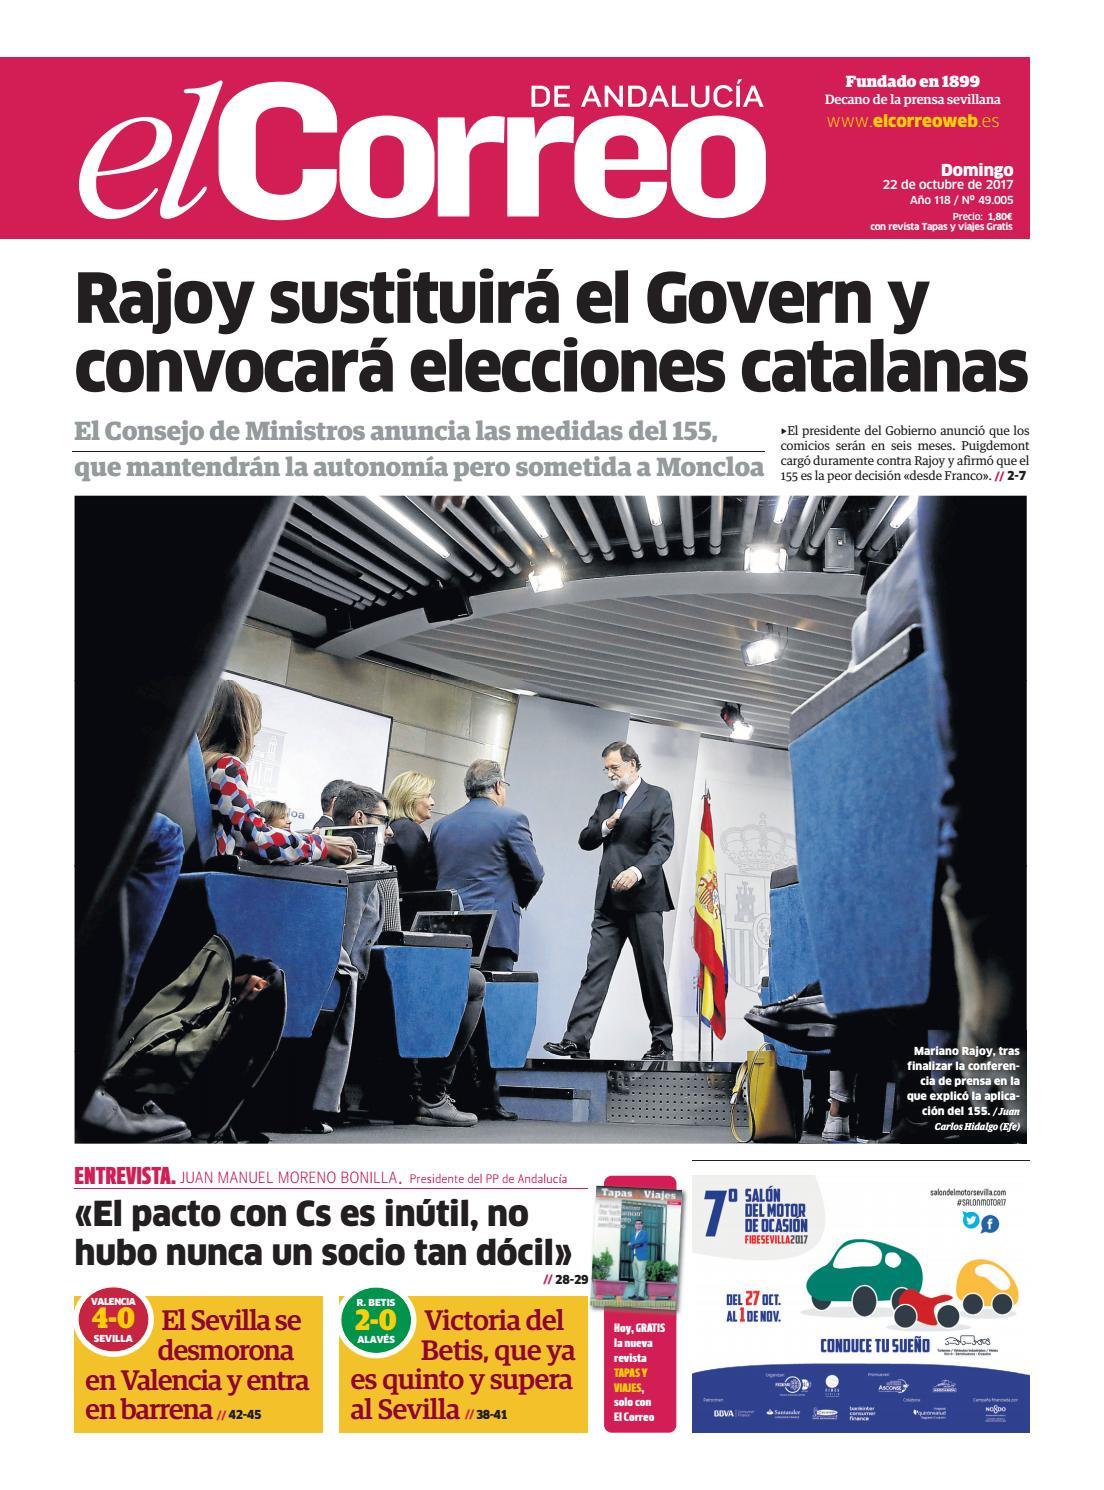 Muebles Saez Yepes - 22 10 2017 El Correo De Andaluc A By El Correo De Andaluc A S L [mjhdah]https://image.isu.pub/160229121259-b2943cccdb7f921ff7a43c3b3444550e/jpg/page_1.jpg